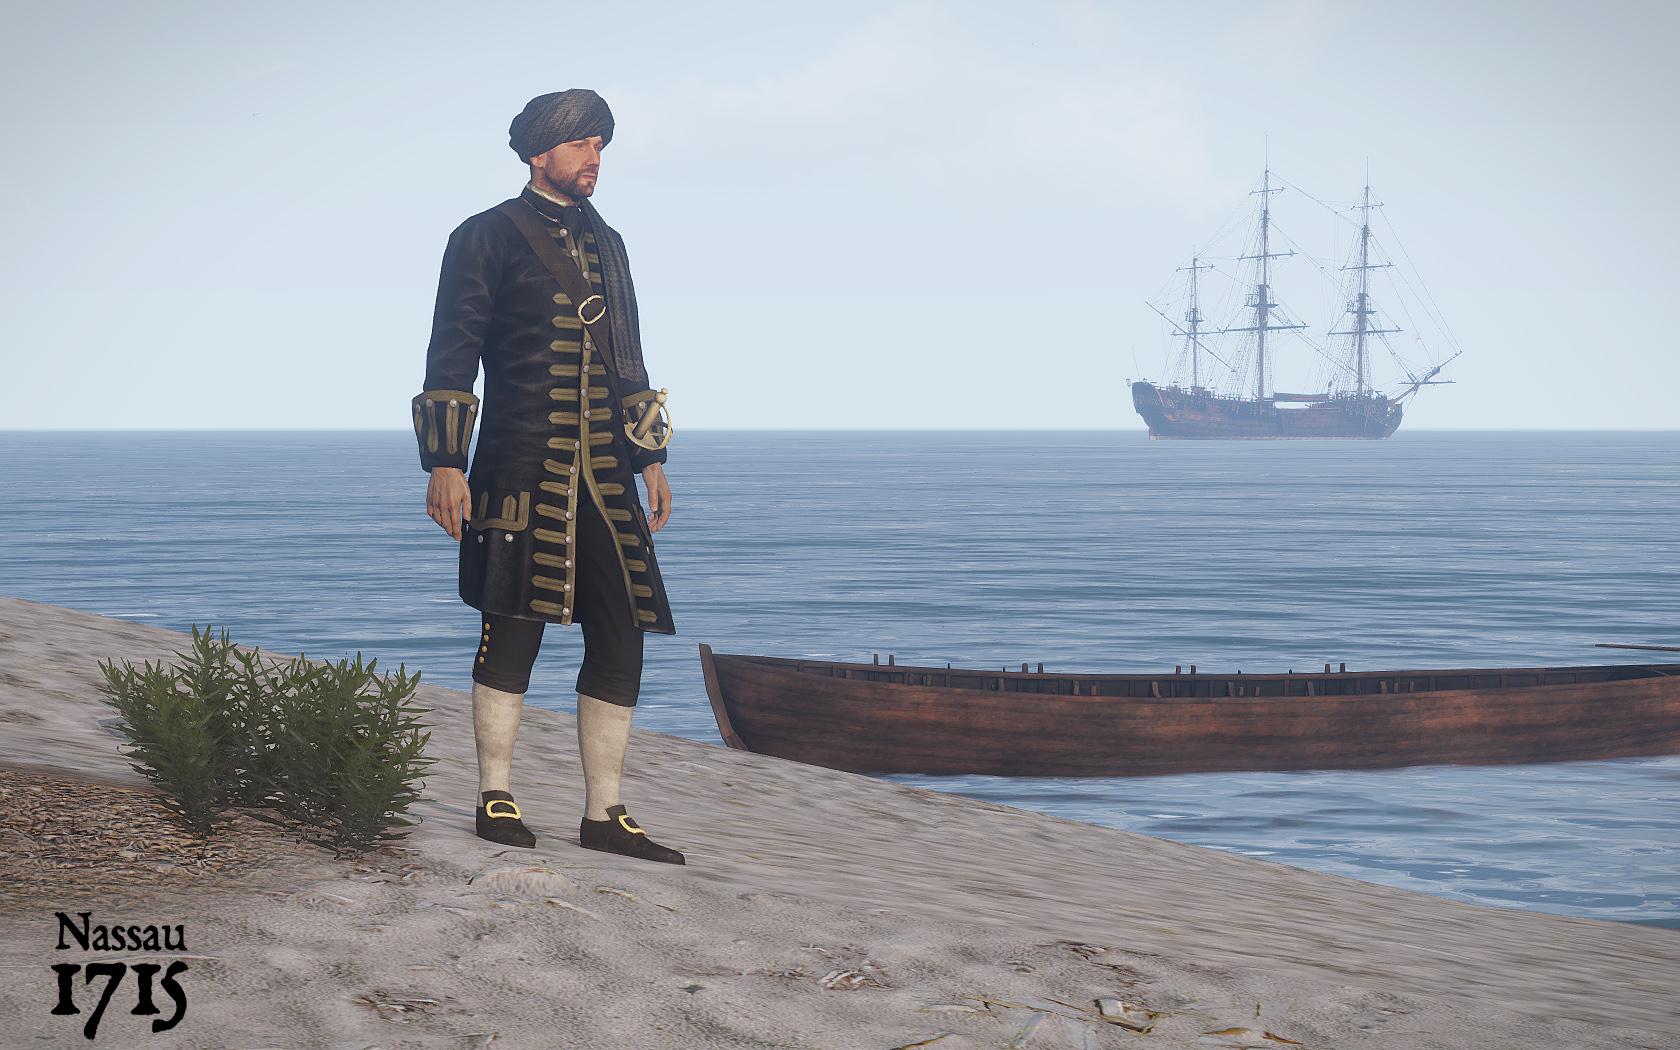 1715_pirate1.jpg